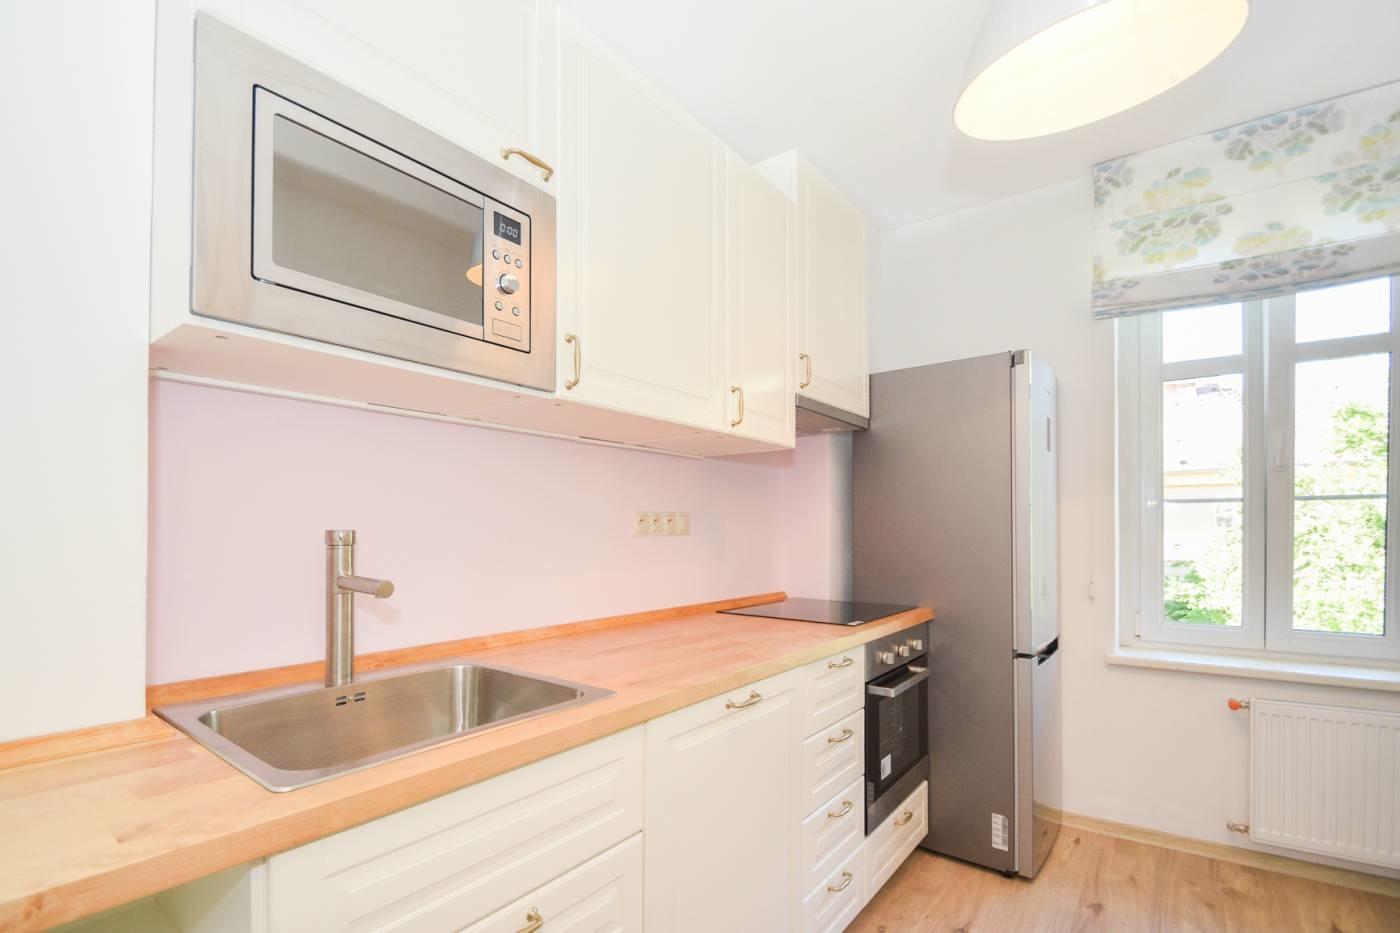 4-bedroom-luxury-apartment-city-center-7min-walk-medical-uni-52157b6062f52f5cebe28dbce6dda52c